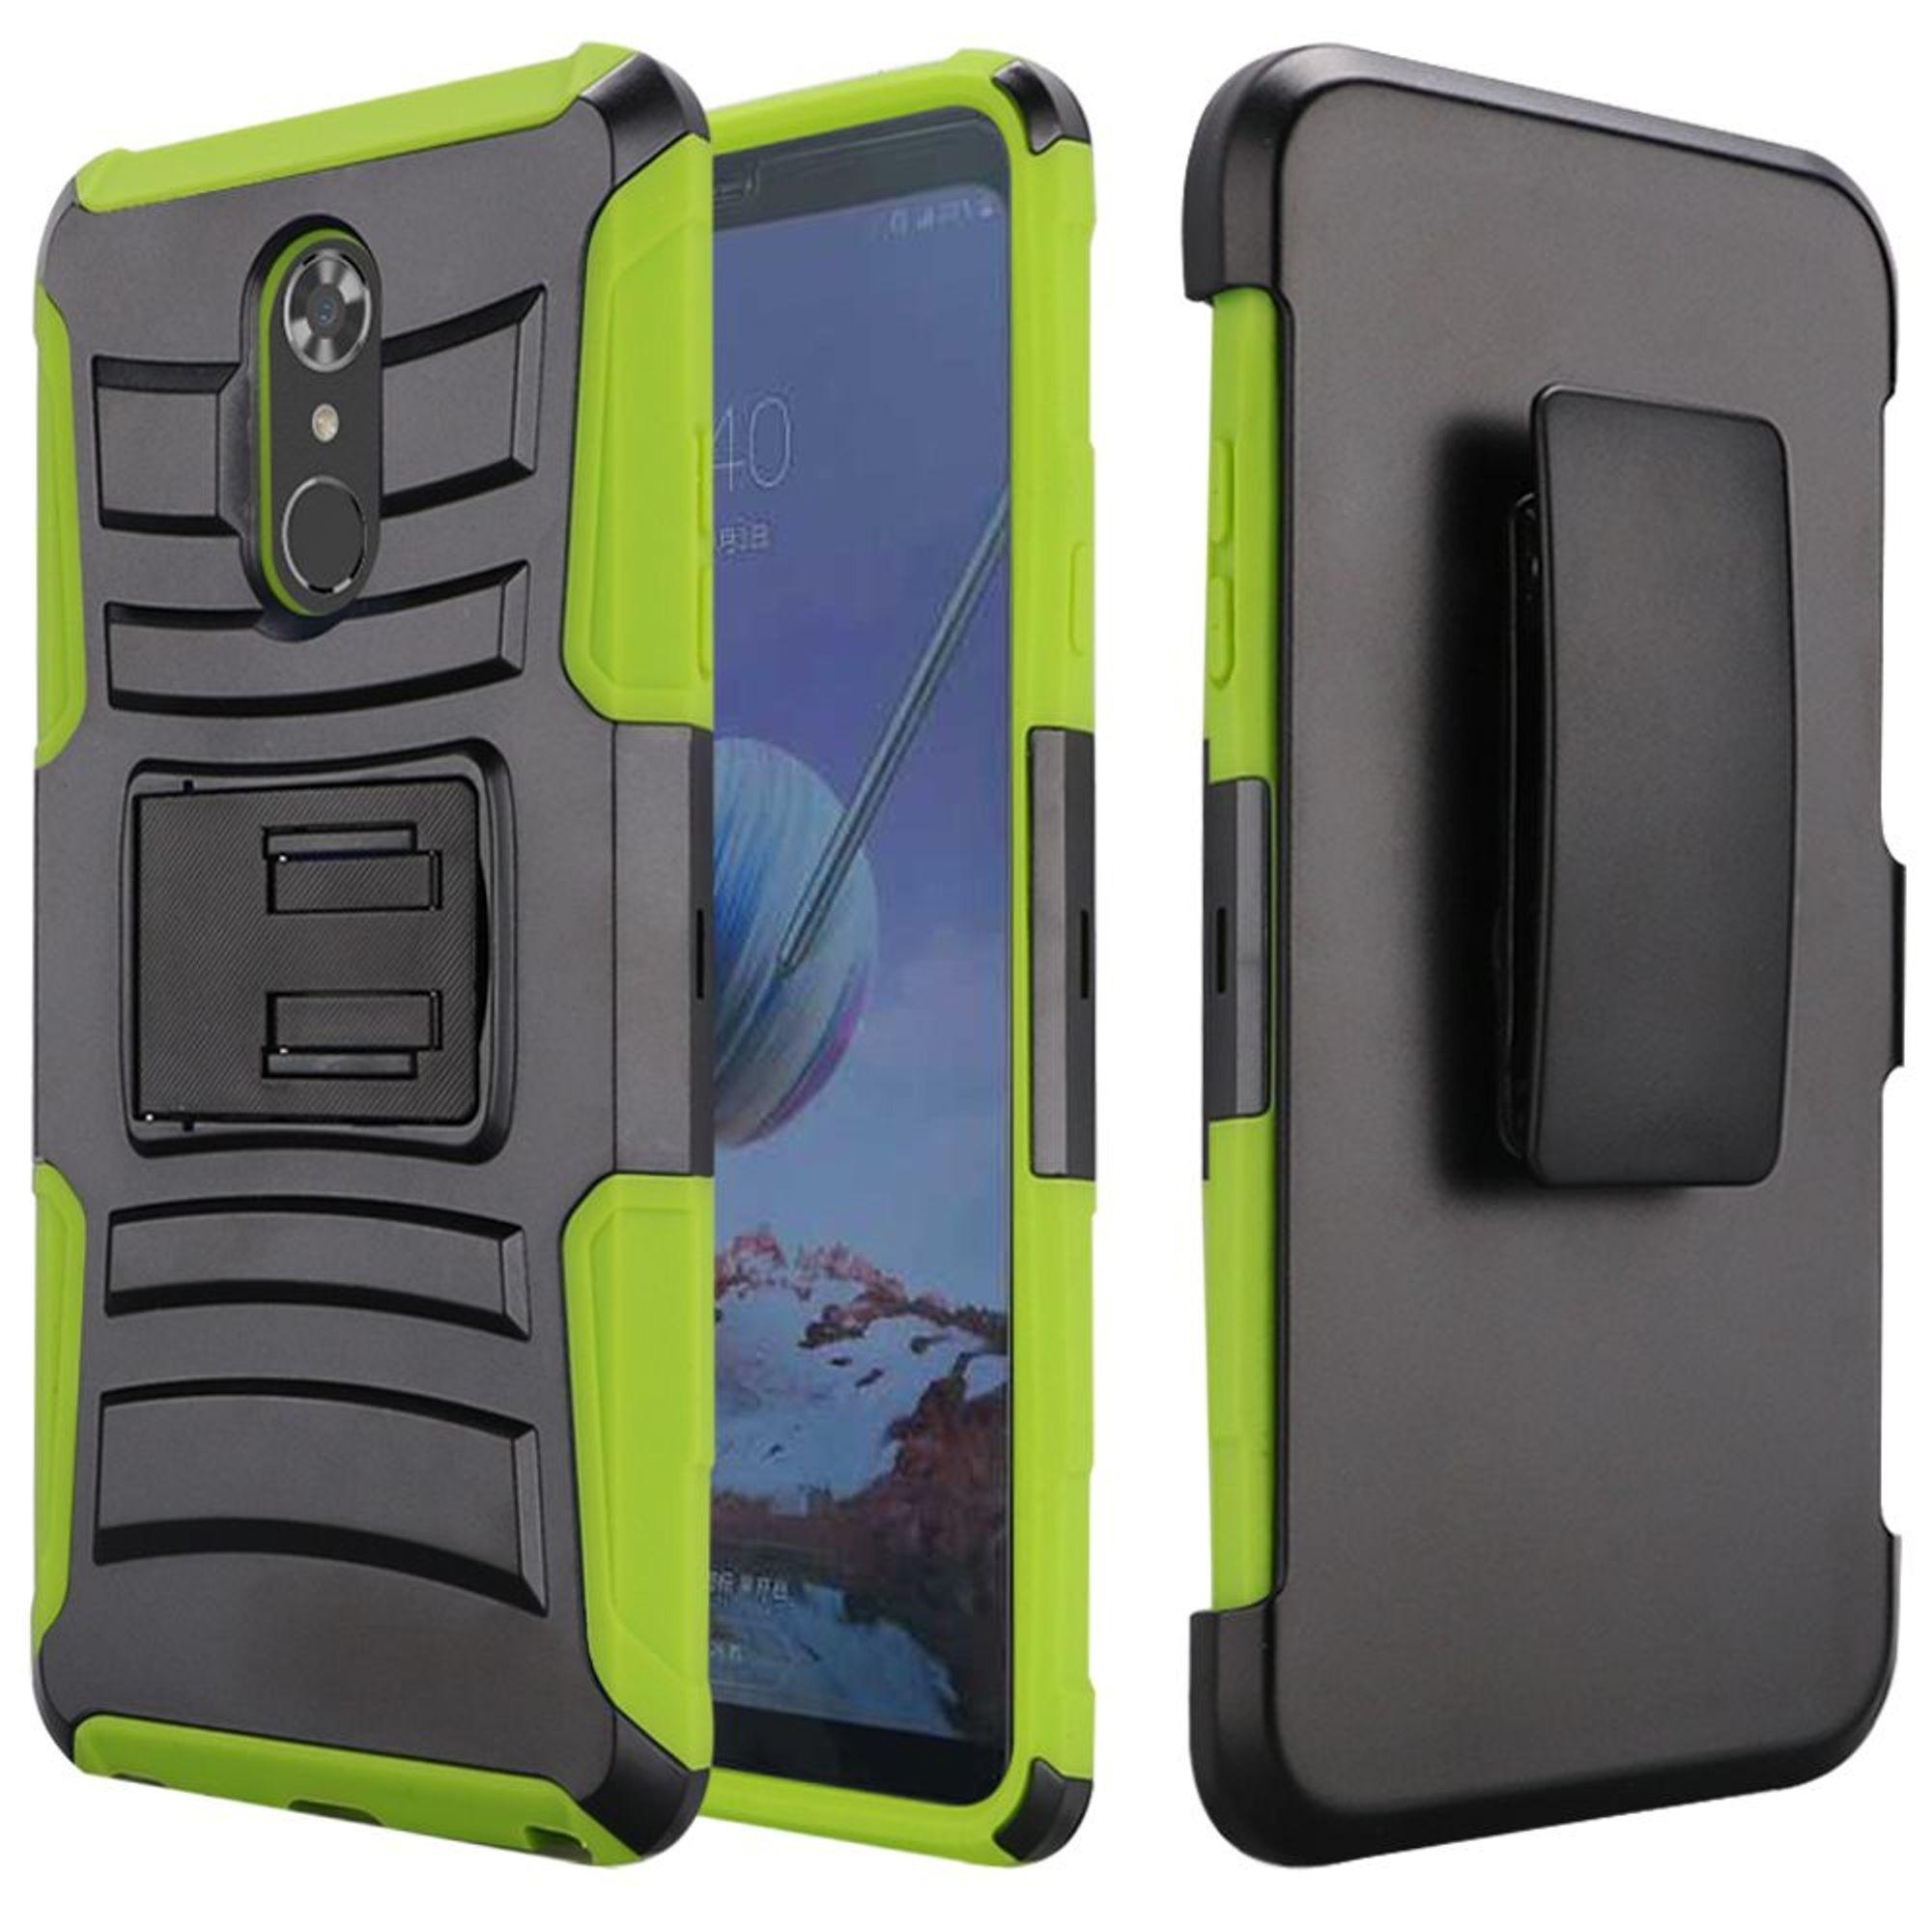 LG  Stylo 4 Stylo 4 plus Case, by HR Wireless Hard Hybrid Plastic Cover Case w/stand/Holster For LG  Stylo 4 Stylo 4 plus - Black/Light Green